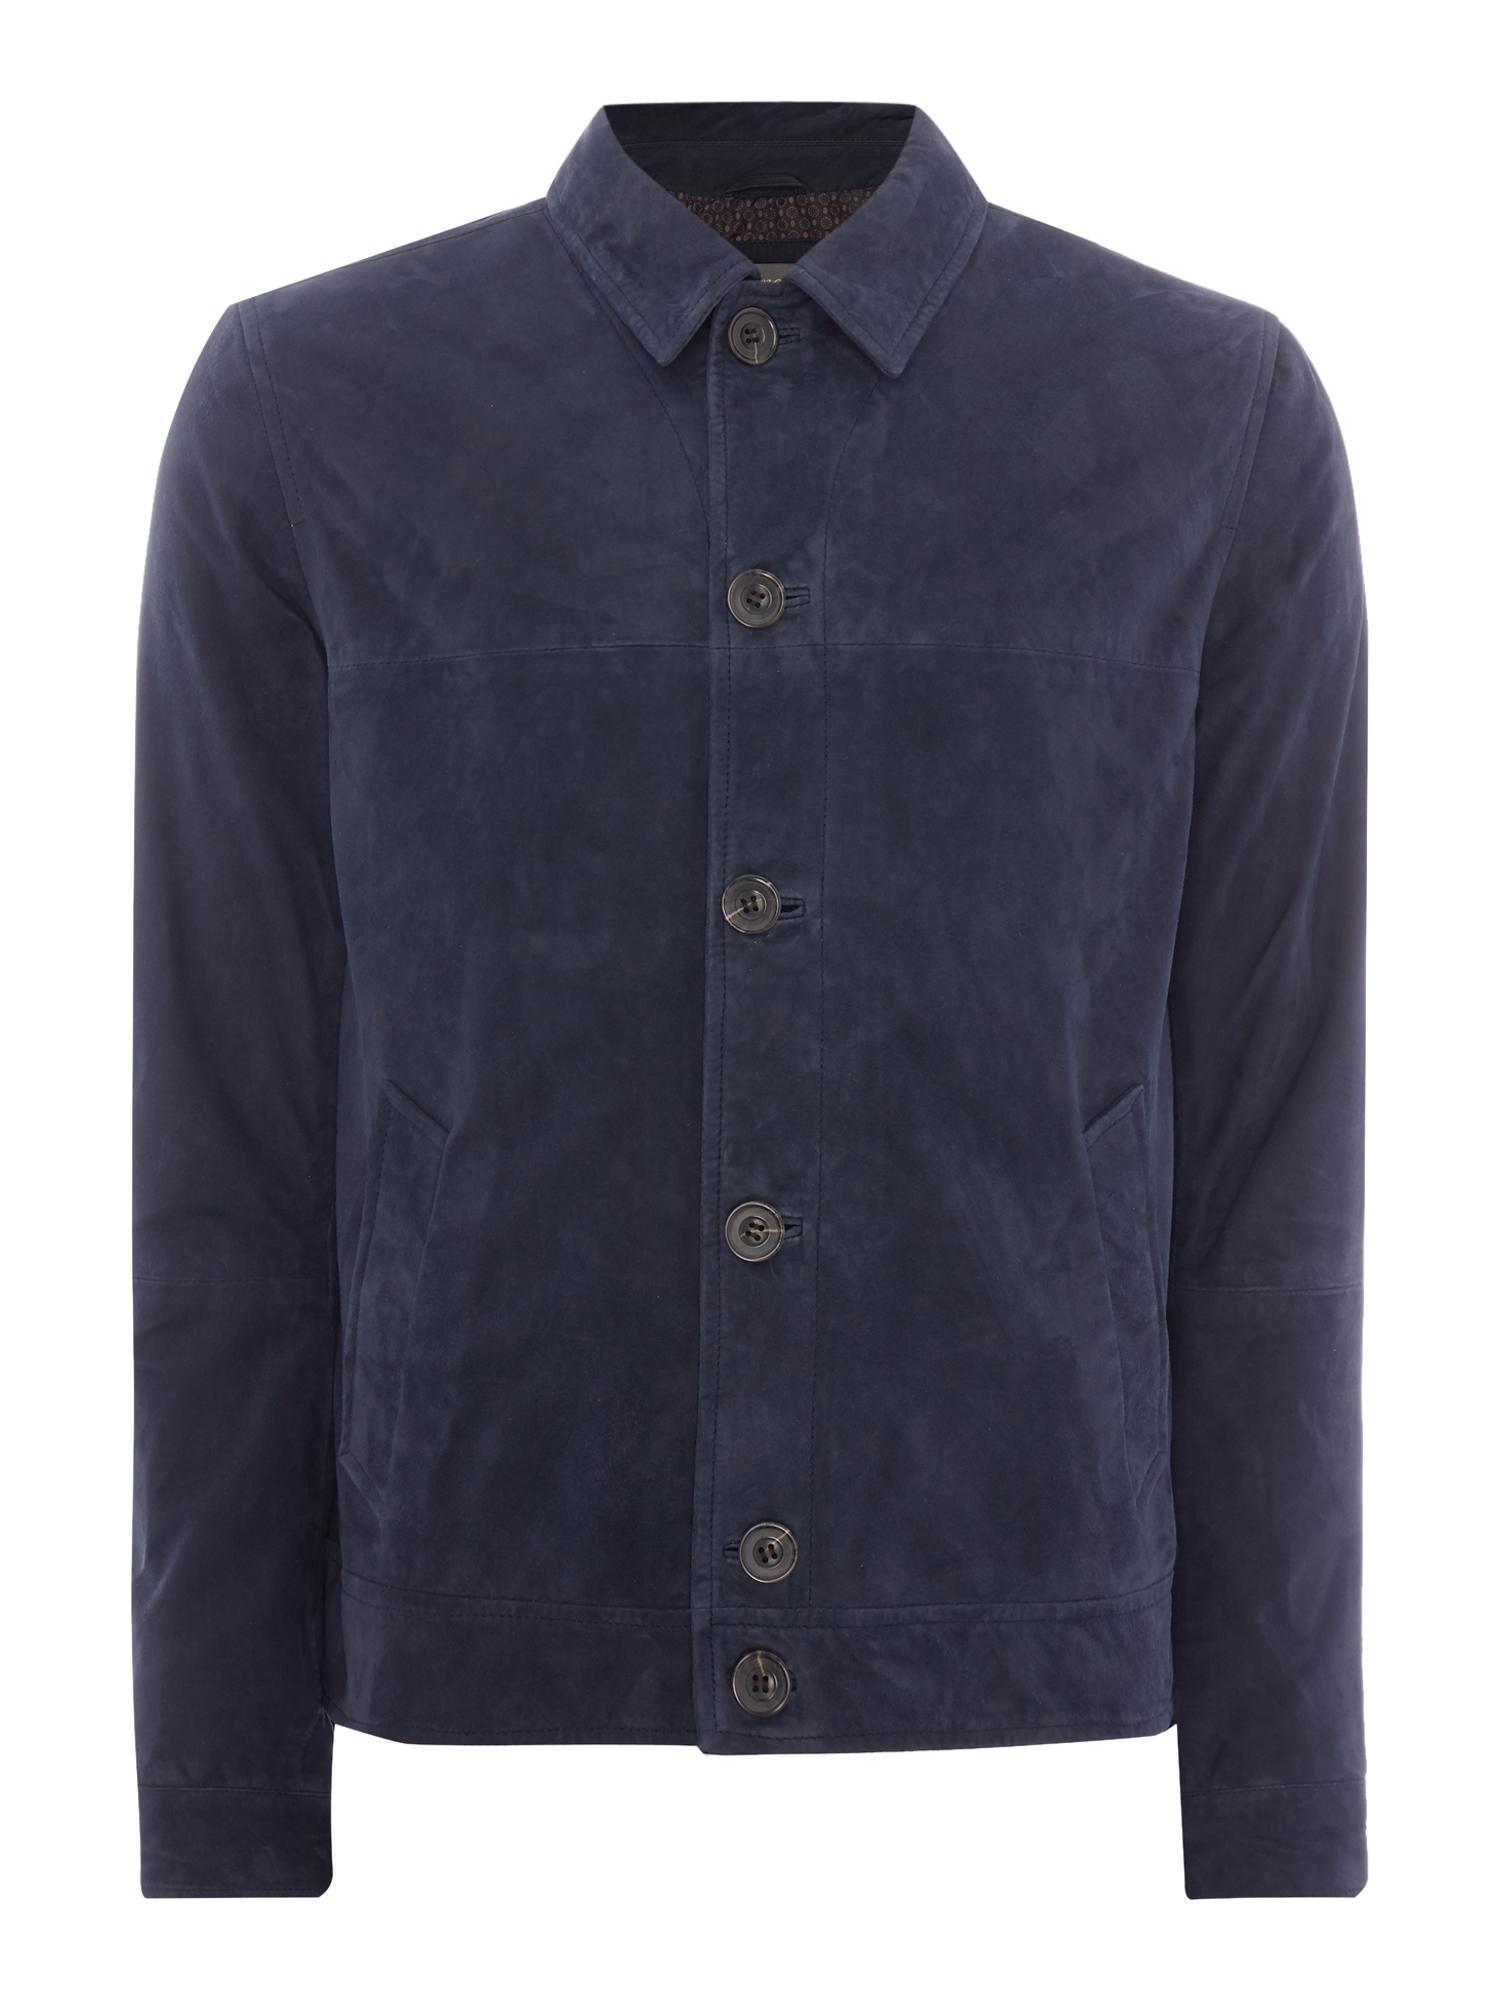 Linea Lightweight Jacket